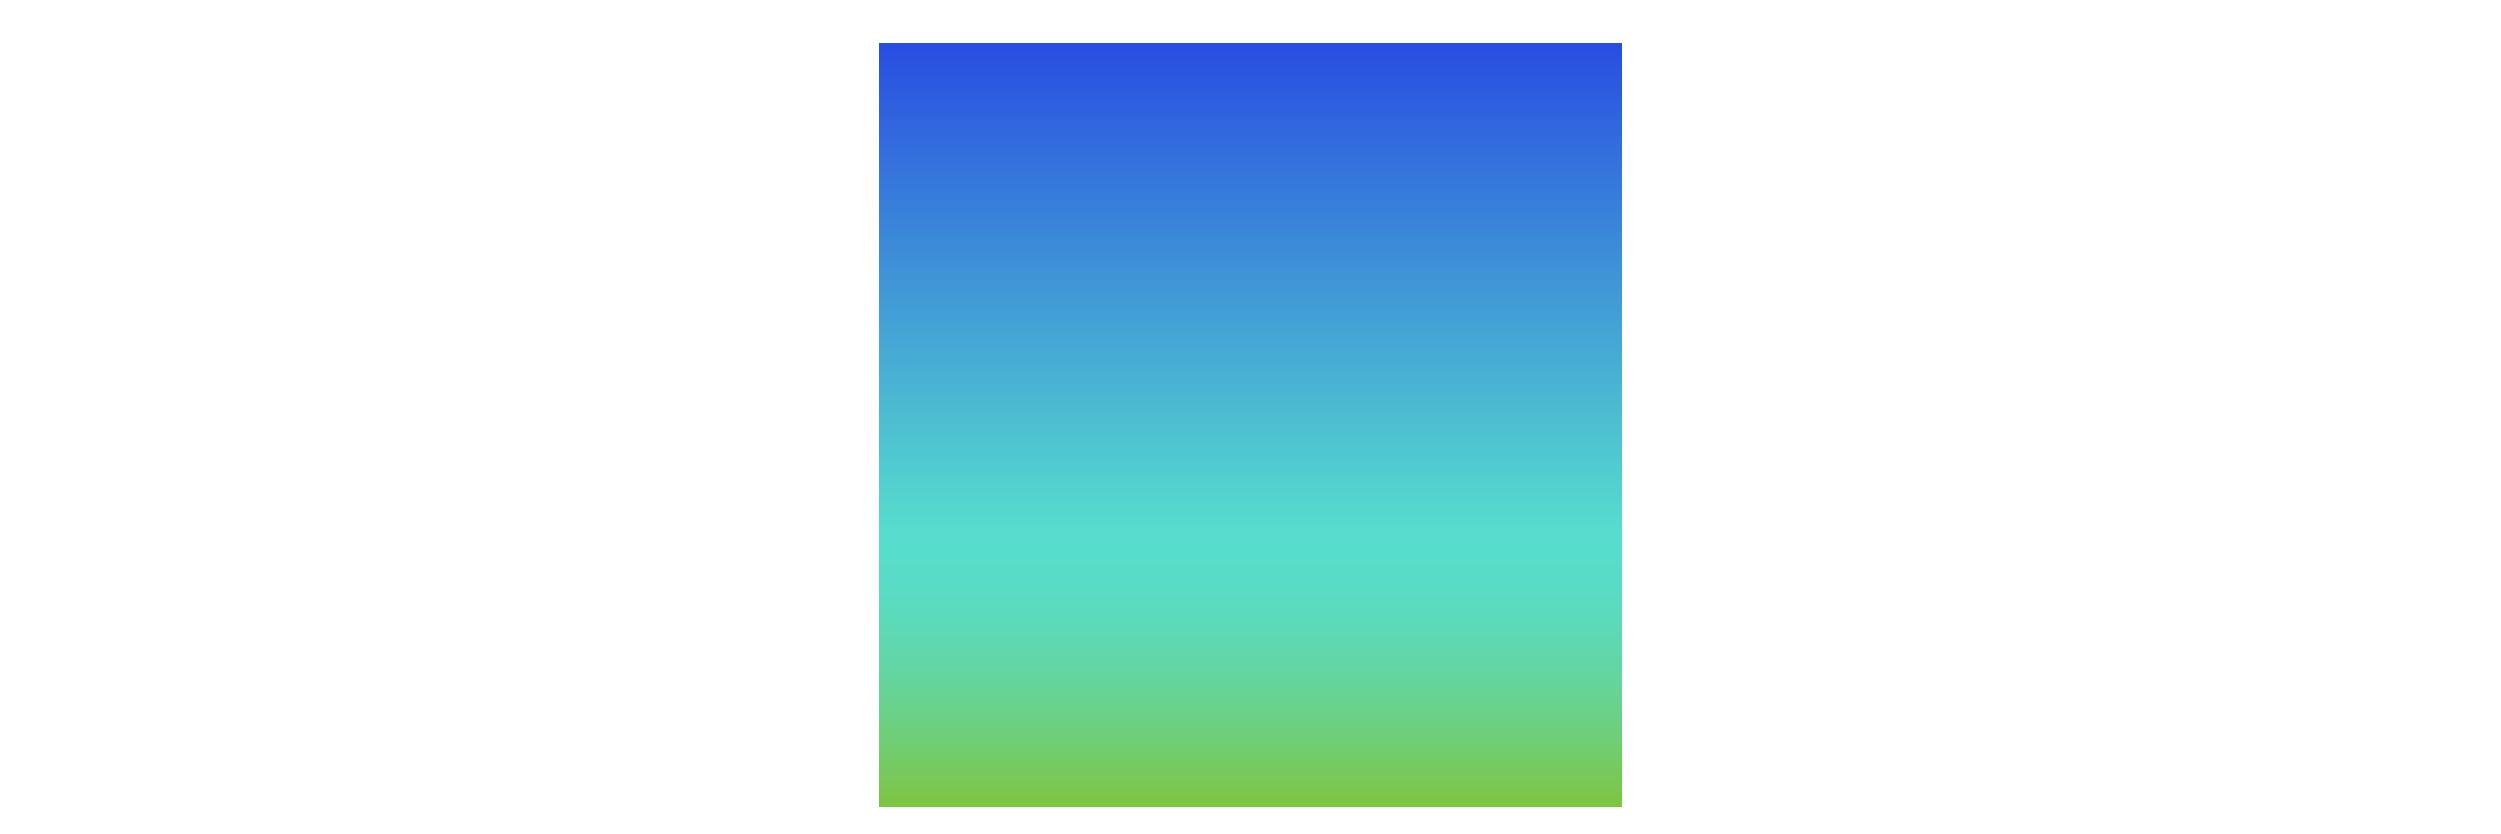 Where to Watch logo